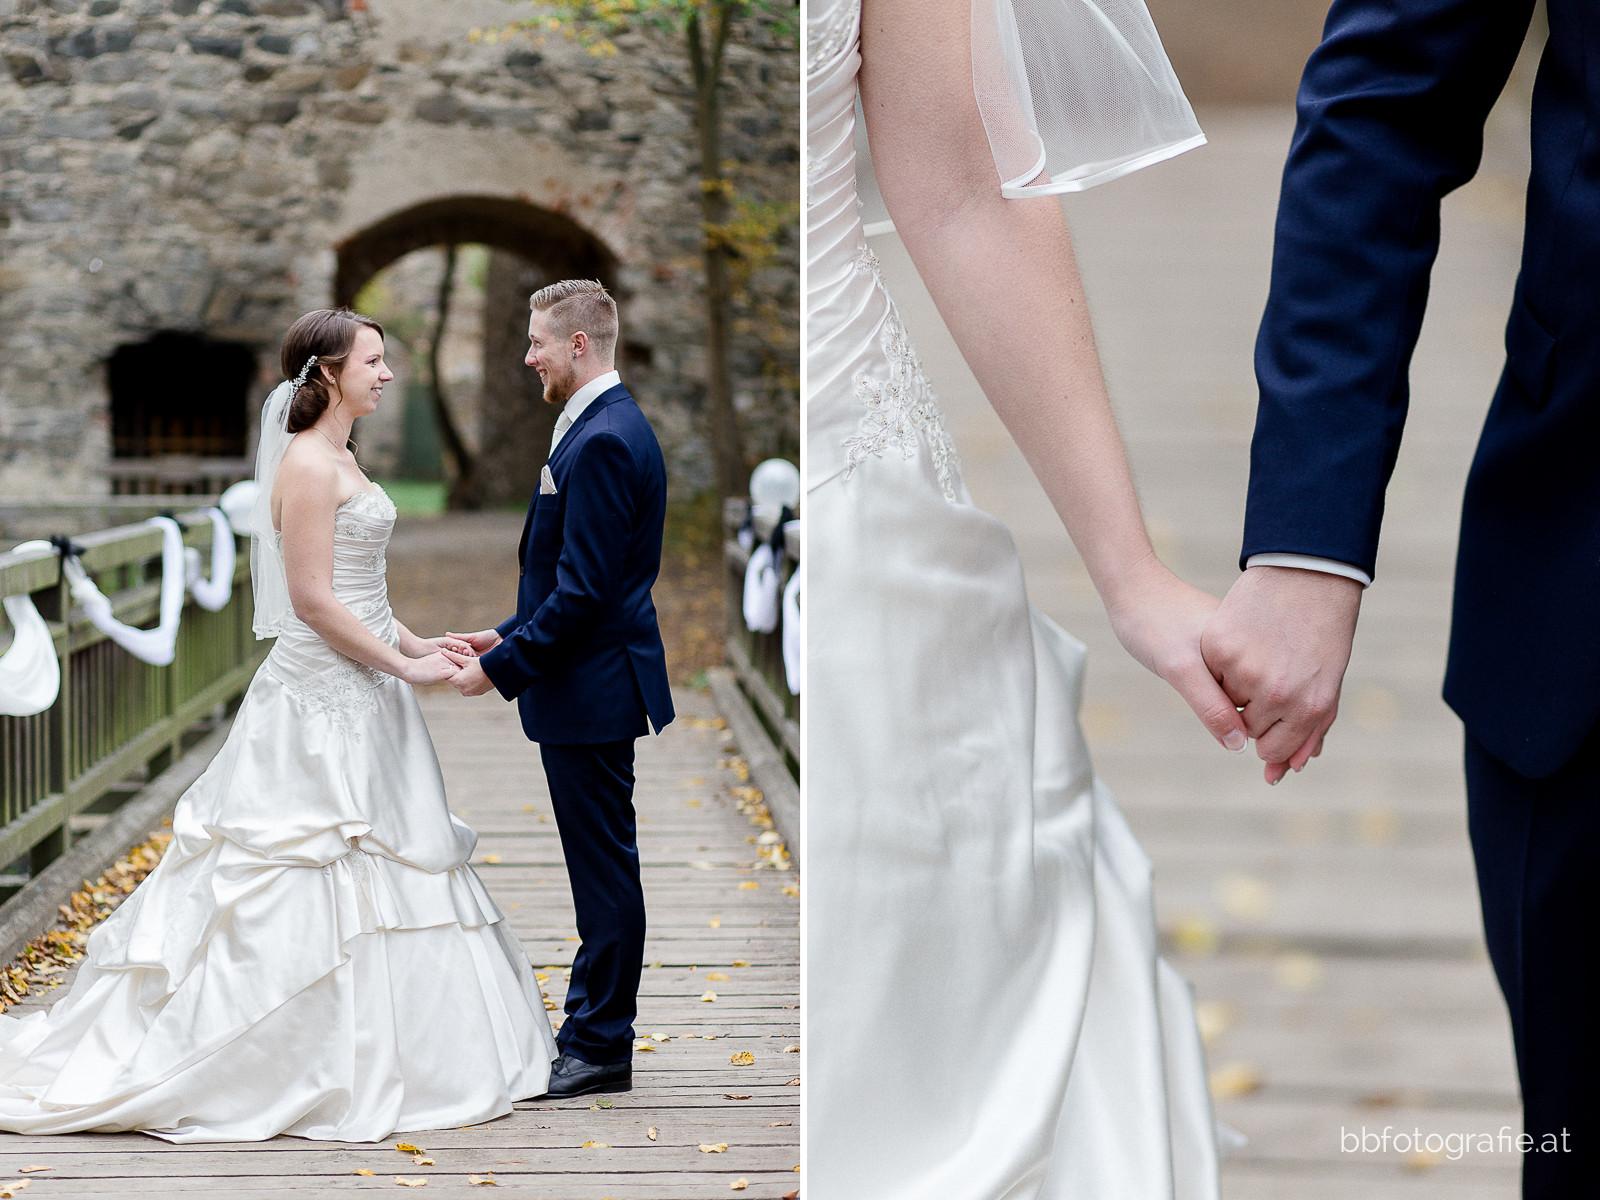 Hochzeitsfotograf, Hochzeitsfotograf Niederösterreich, Hochzeitslocation Niederösterreich, Hochzeitslocation Burgruine Dobra, b&b fotografie